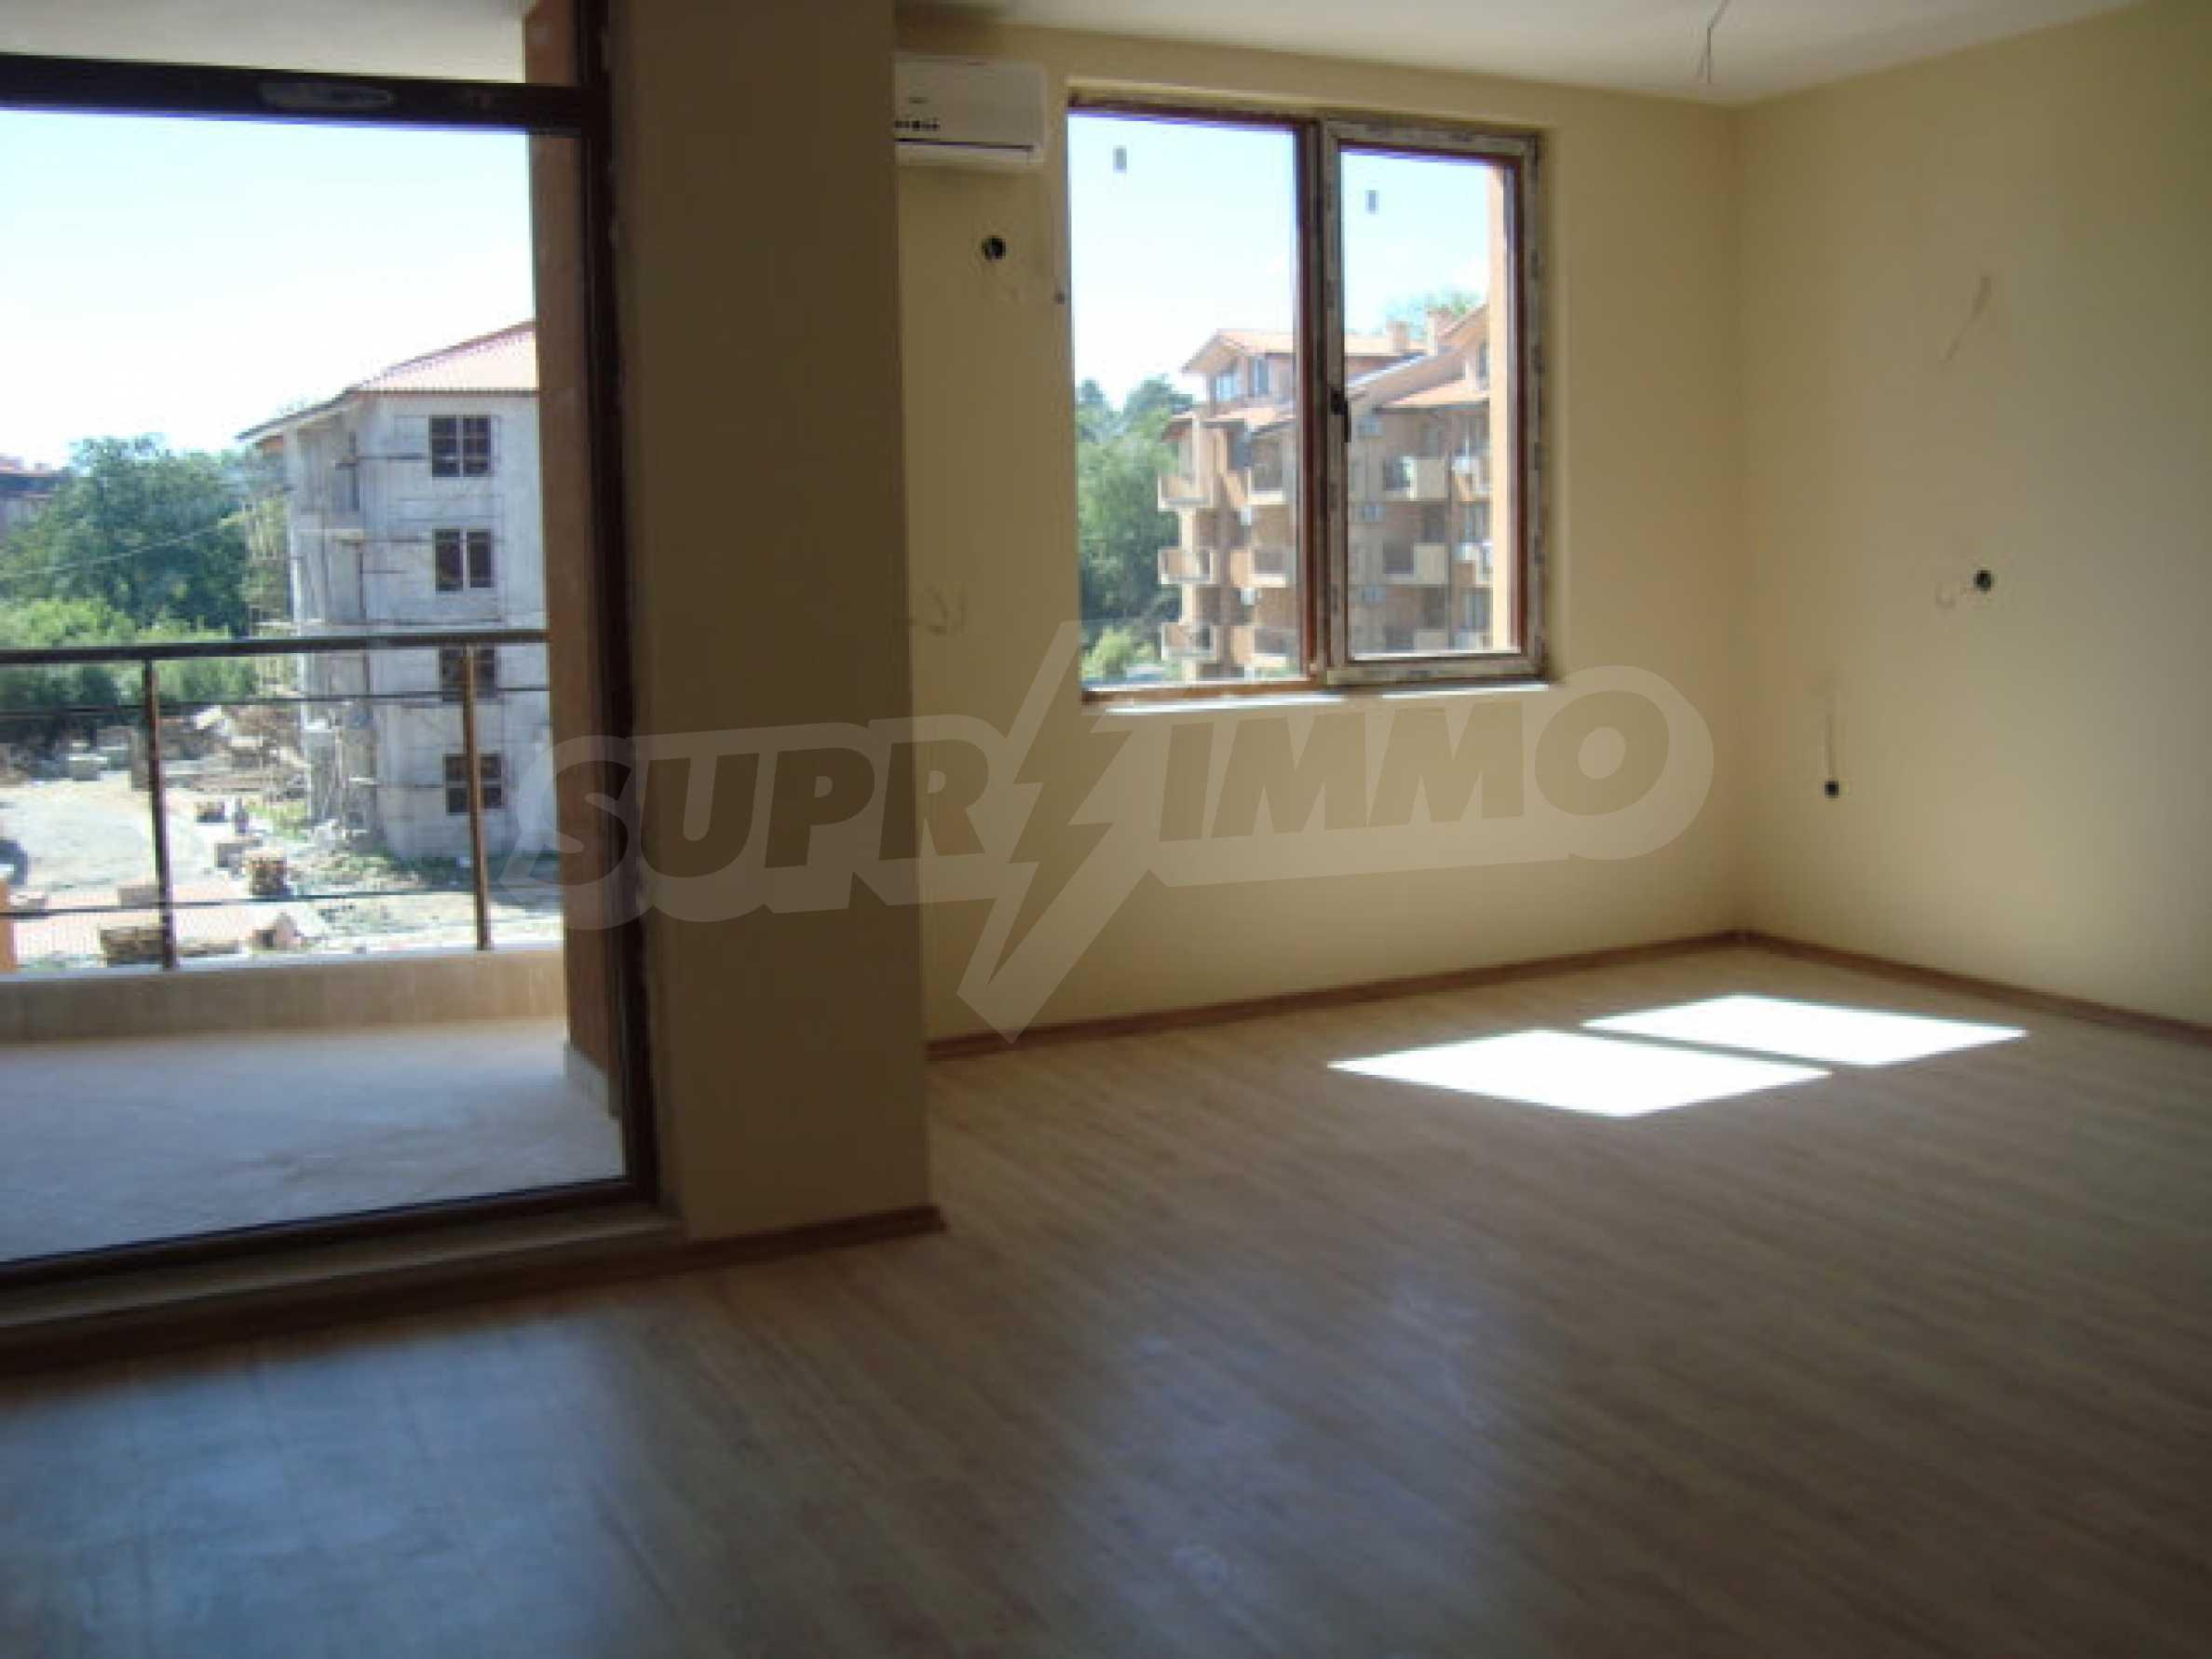 Studios und Apartments im Nestinarka-Komplex in Tsarevo 25